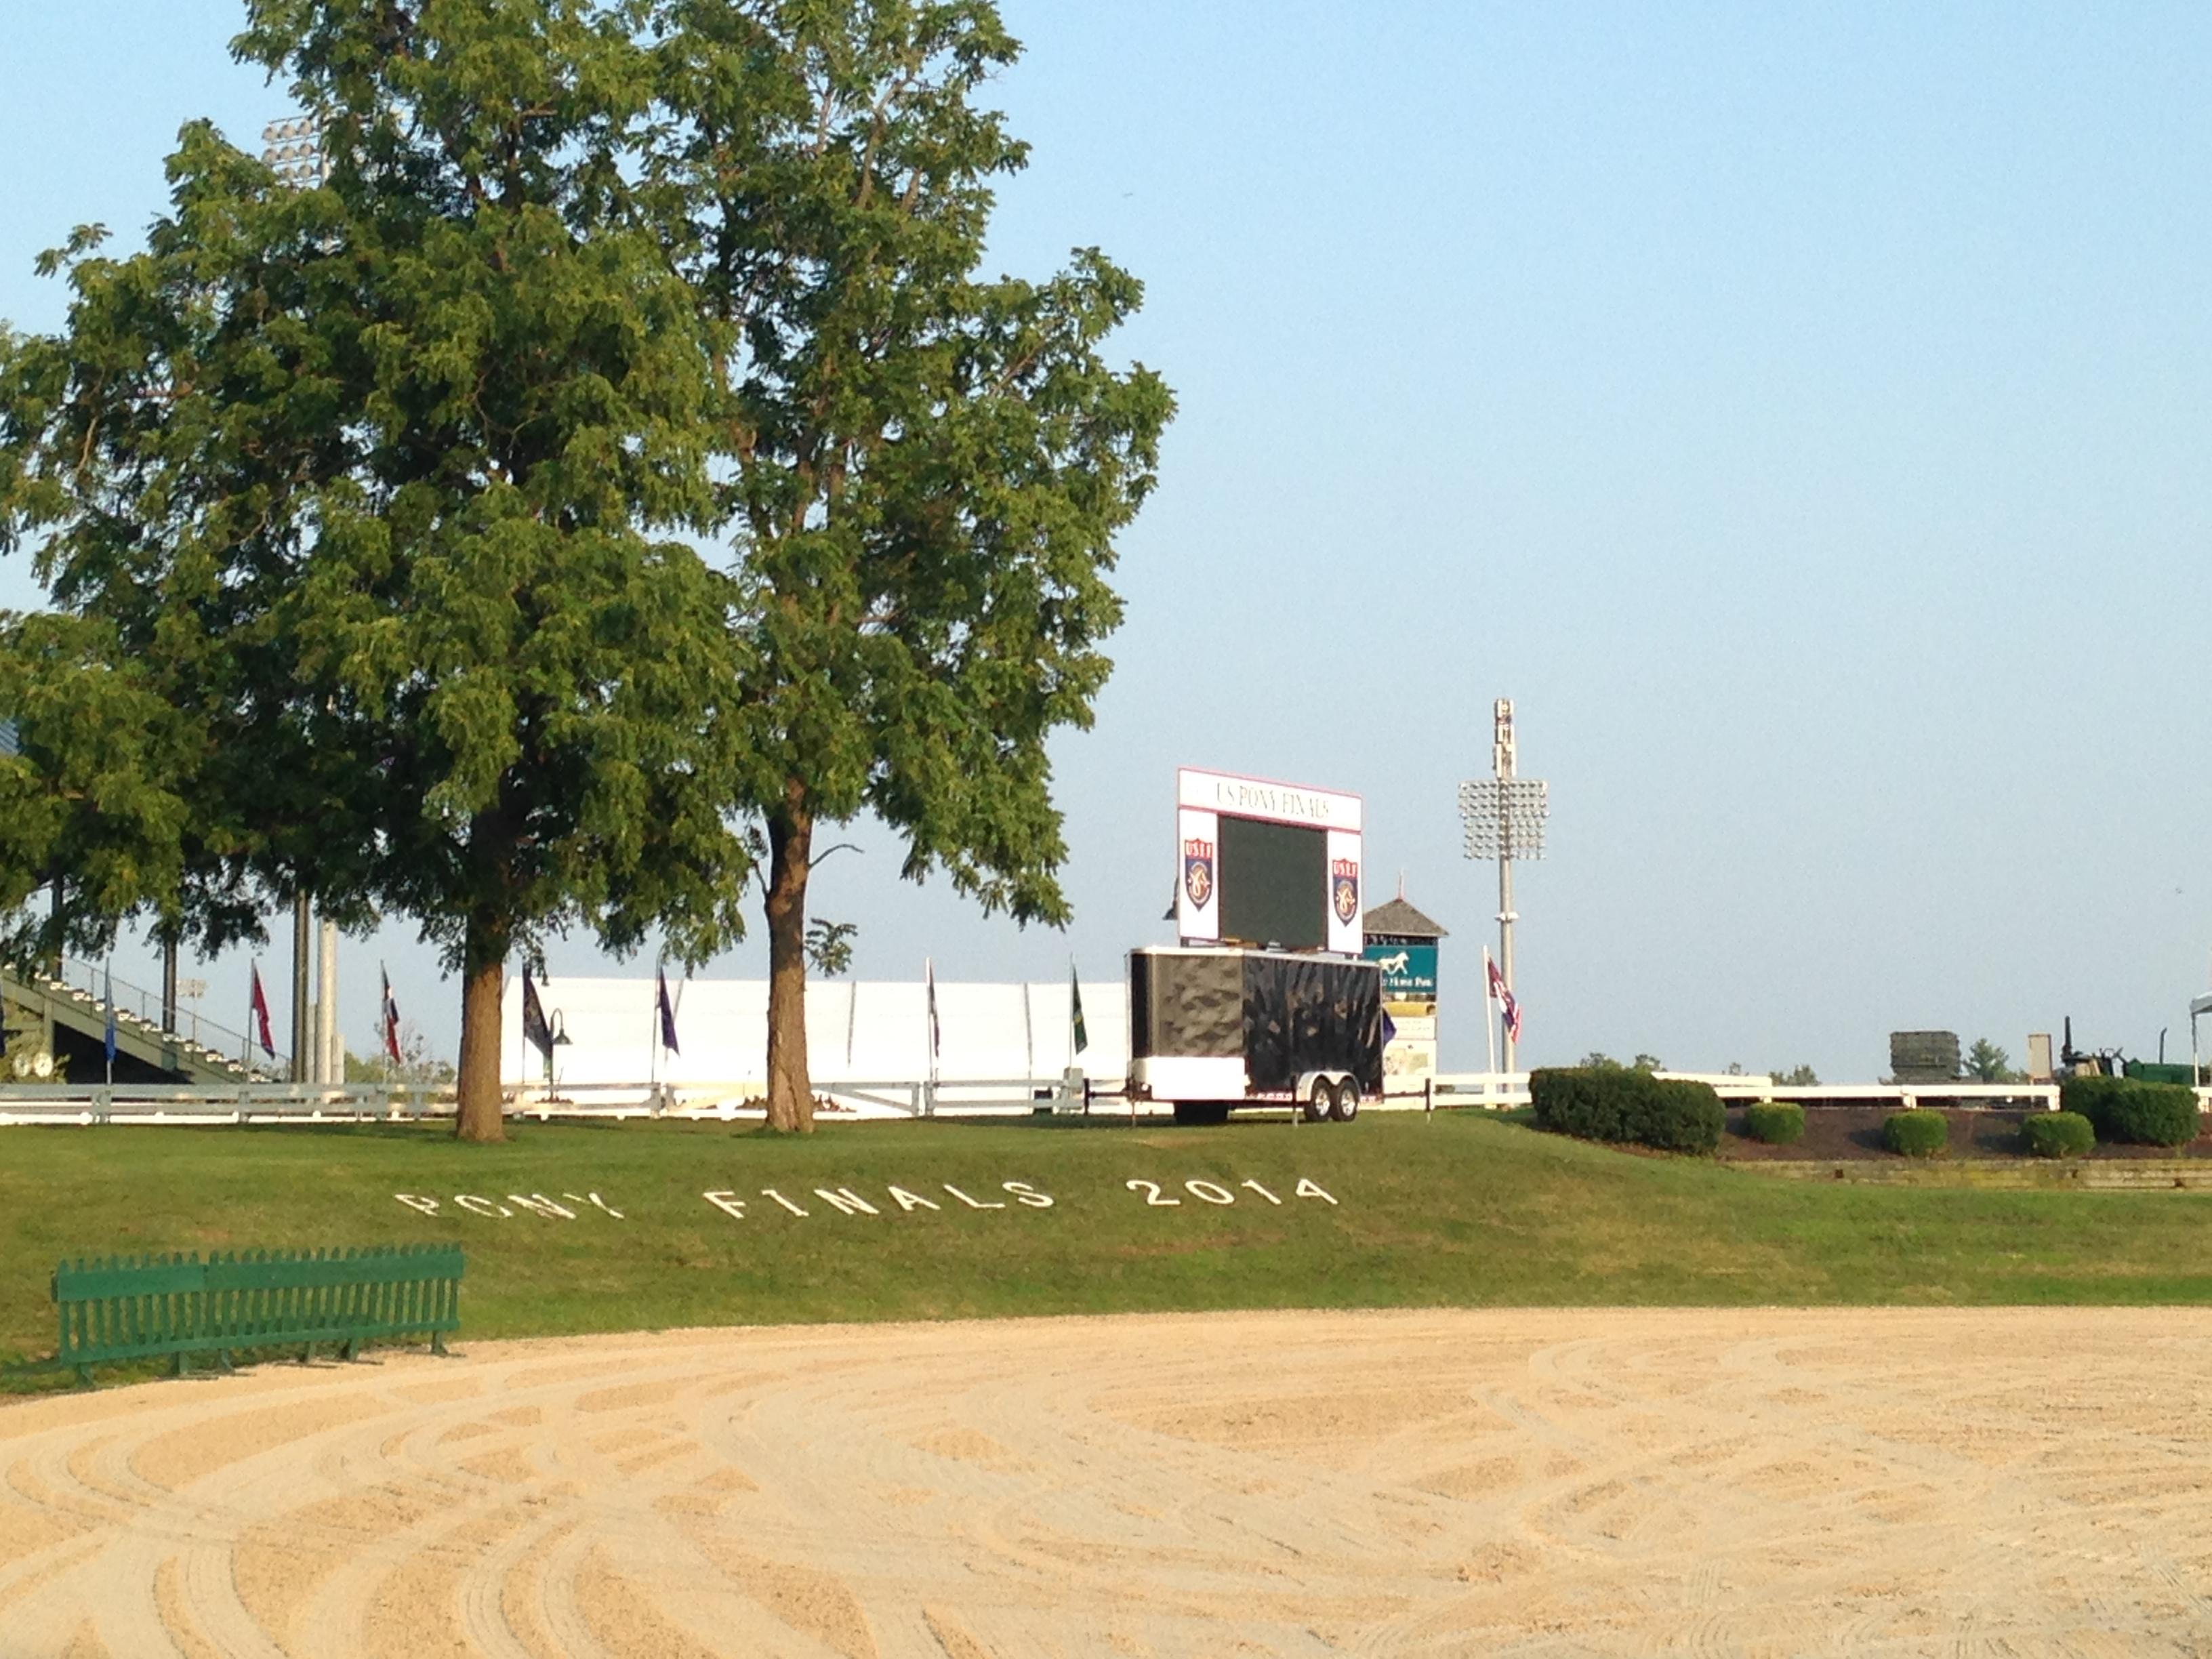 The gorgeous venue — the Walnut Arena at the Kentucky Horse Park. (Photo courtesy of Sydney Flashman)